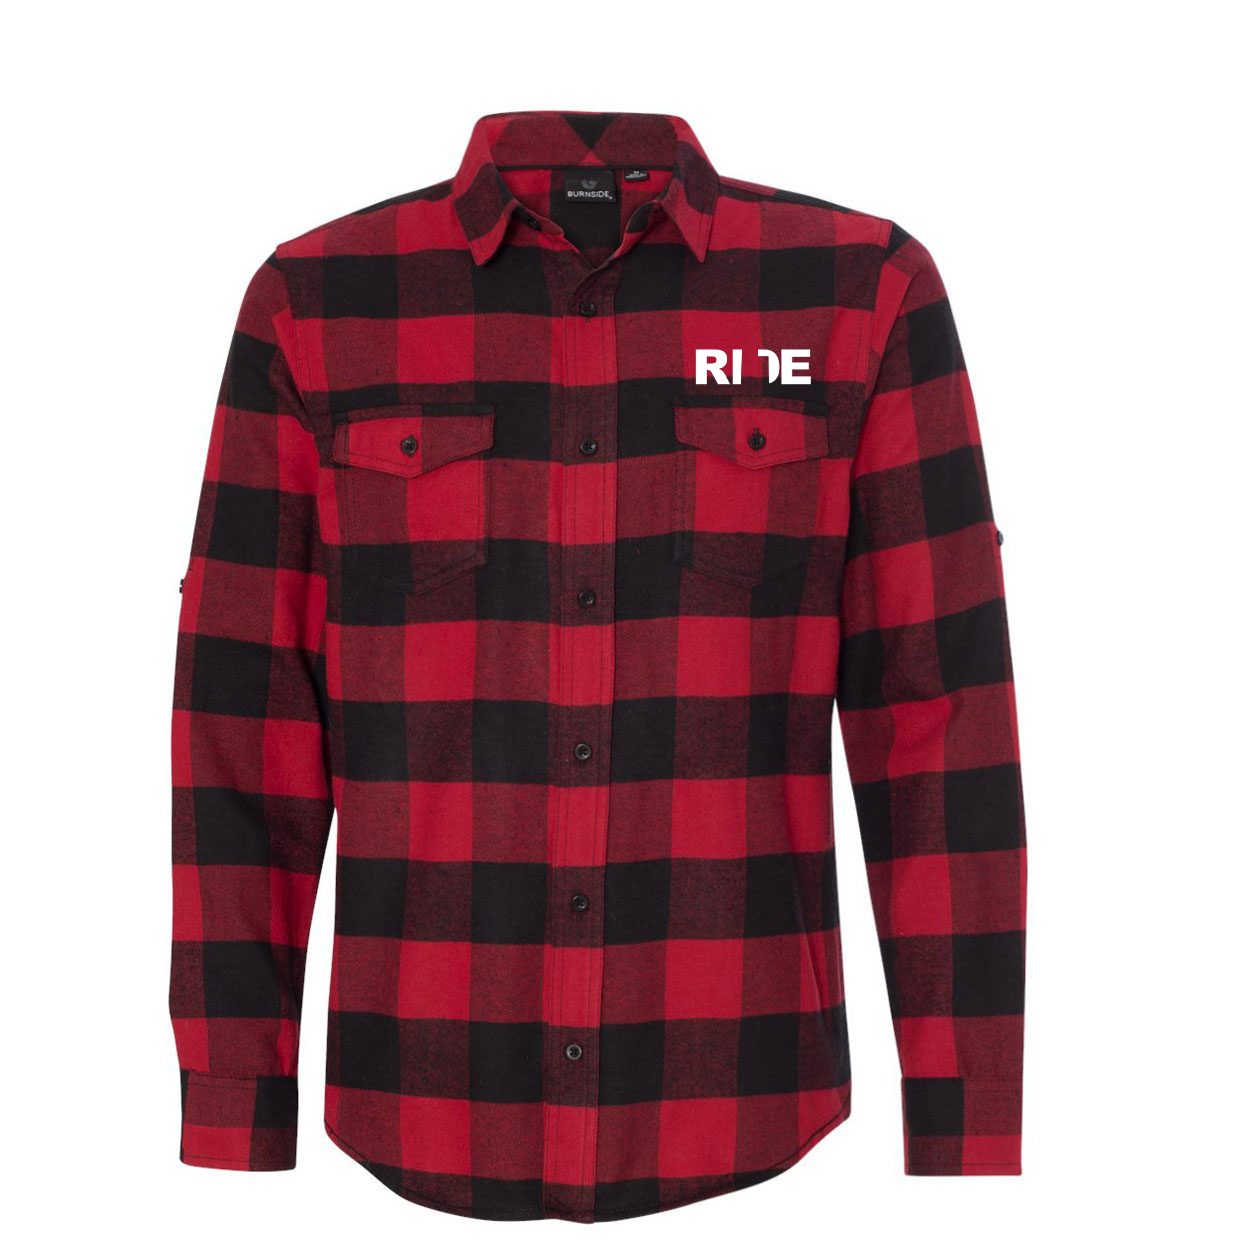 Ride Utah Classic Unisex Long Sleeve Flannel Shirt Red/Black Buffalo (White Logo)